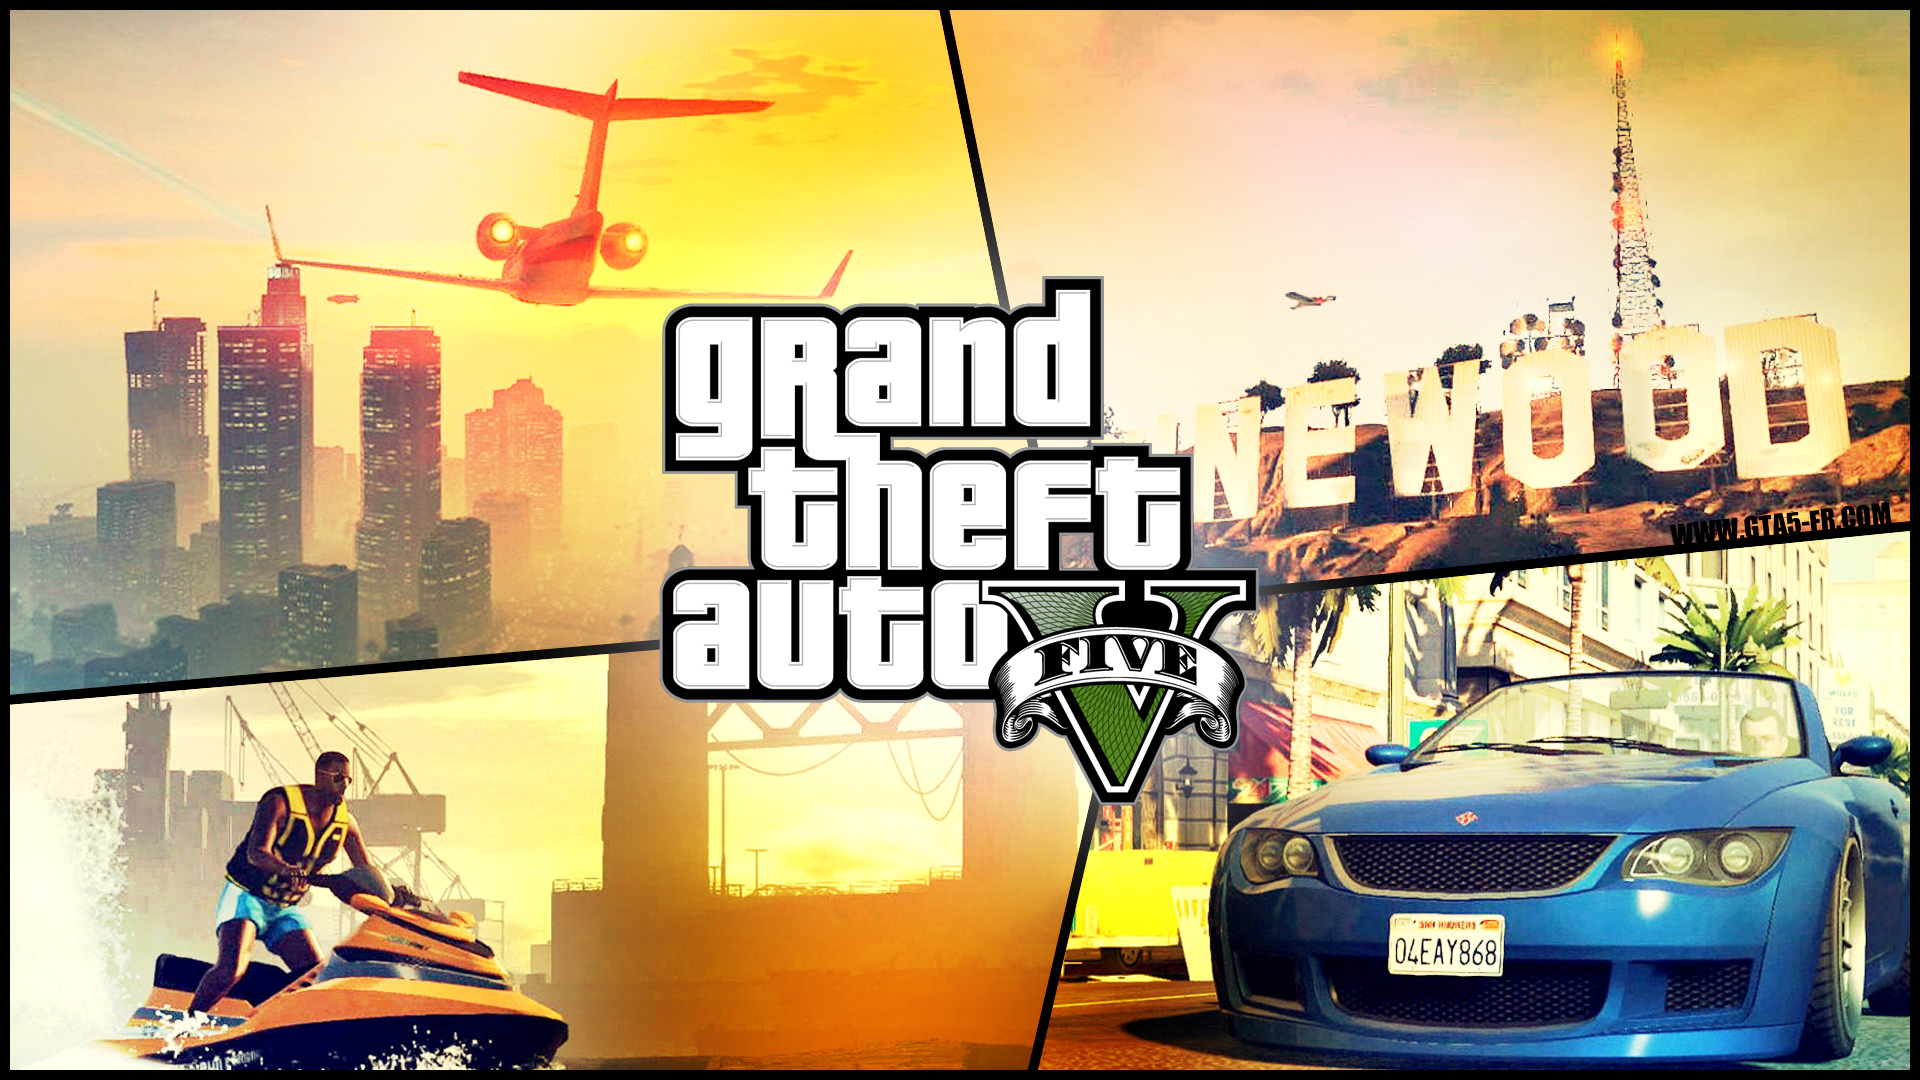 grand theft auto v wallpaper 7